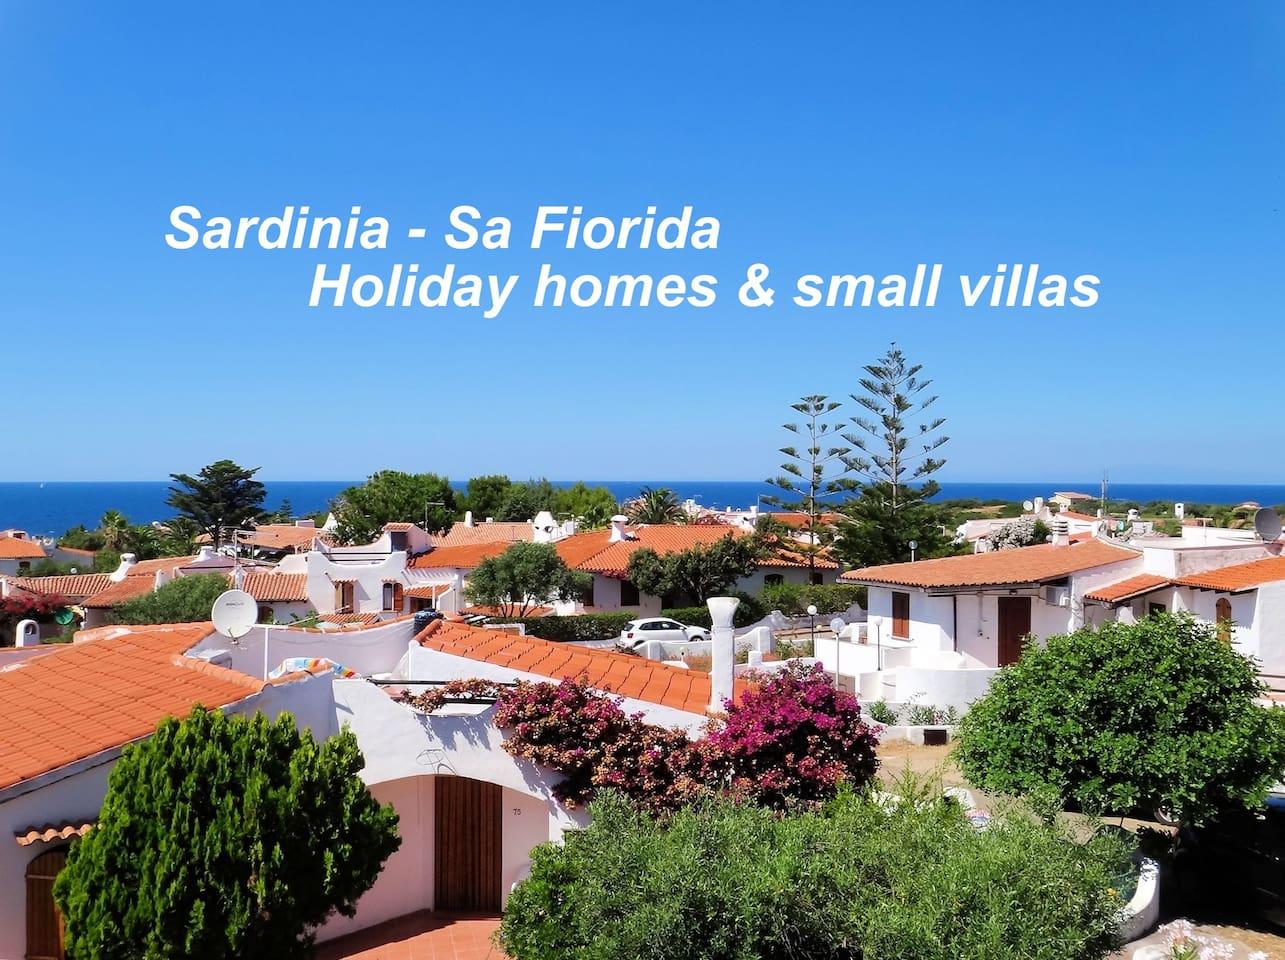 Seaside holiday home in Sardinia (Sa Fiorida D/2)